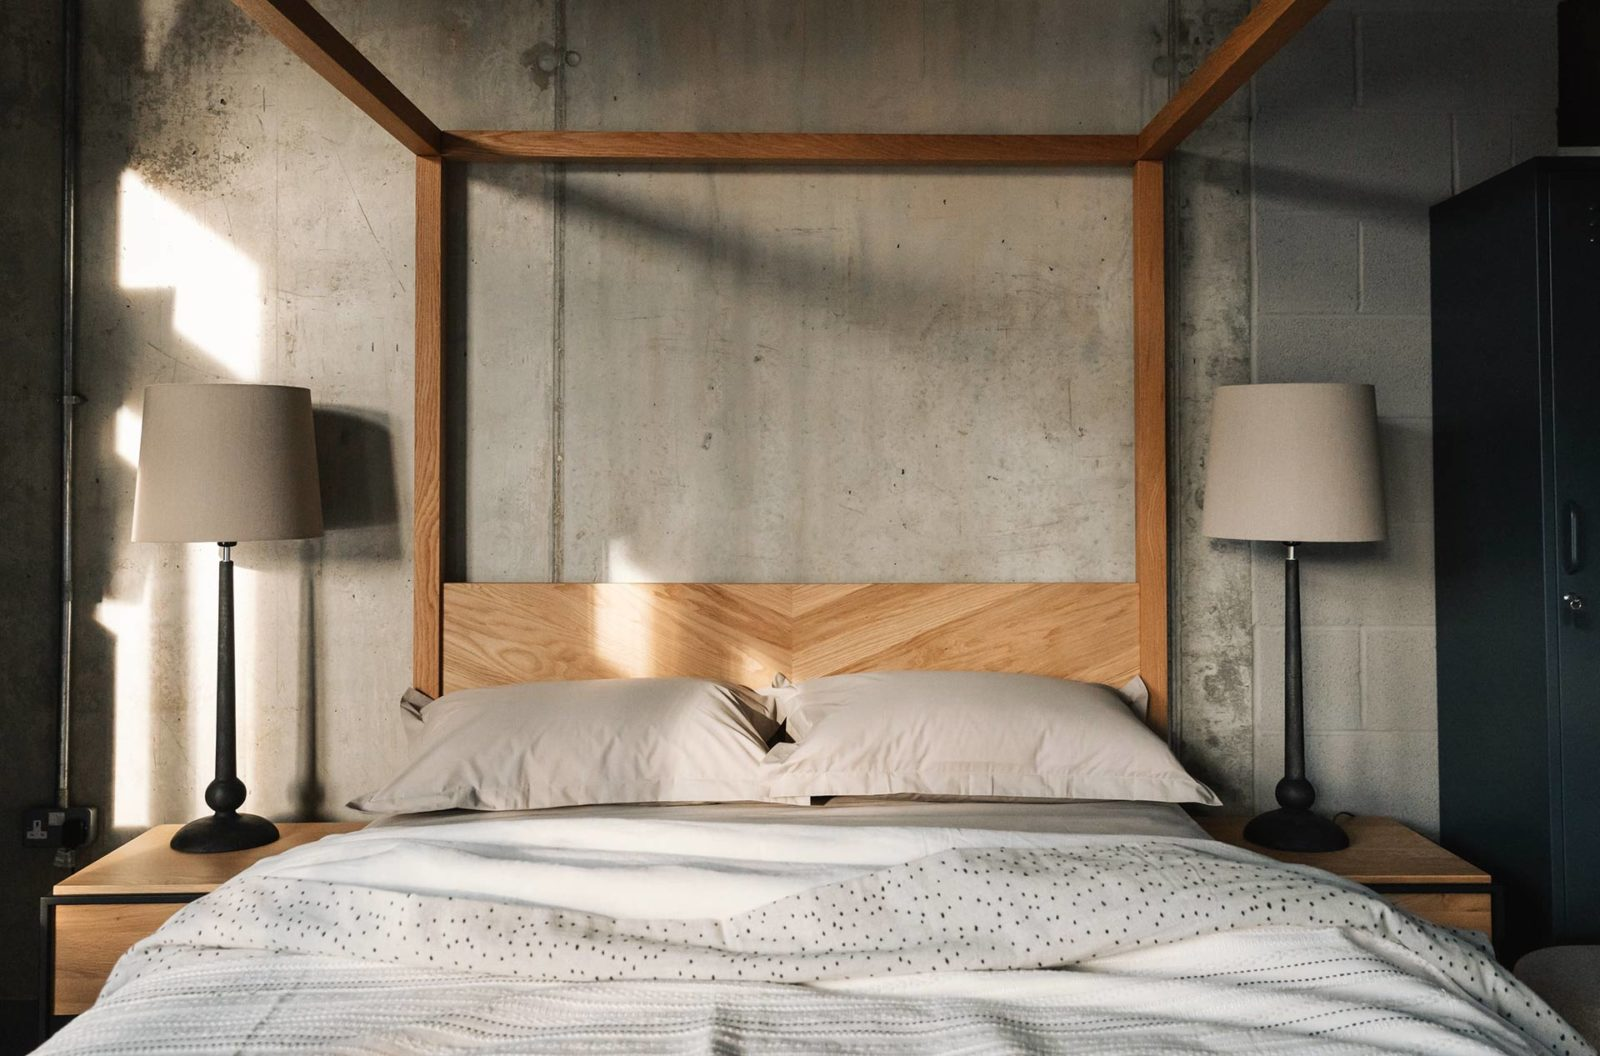 Neutral bedroom scheme - Easycare polycotton bedding on Oak Kelham Four Poster bed